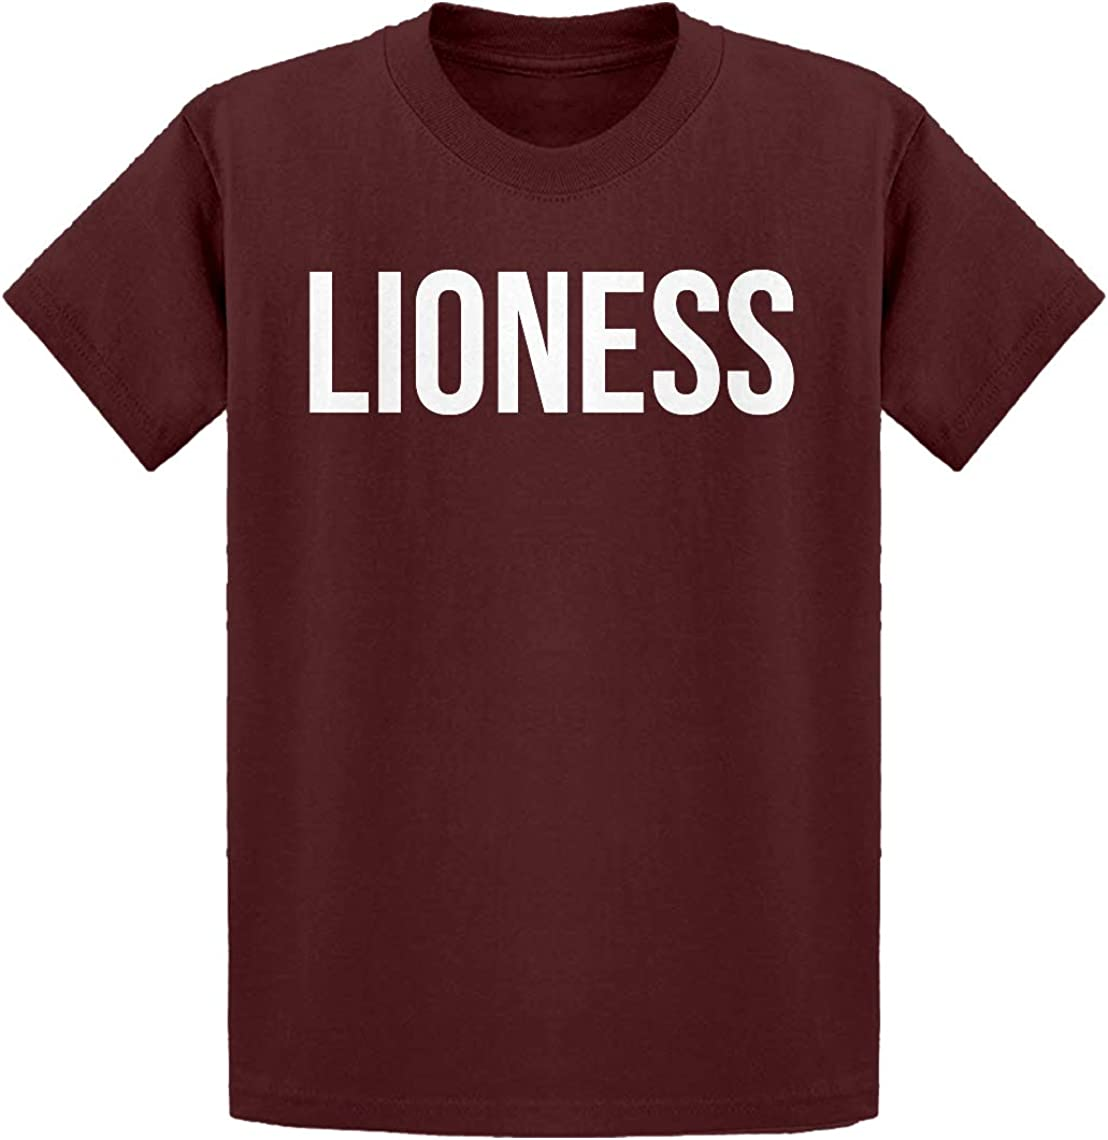 Sports Fan Tees Lioness Kids T-Shirt